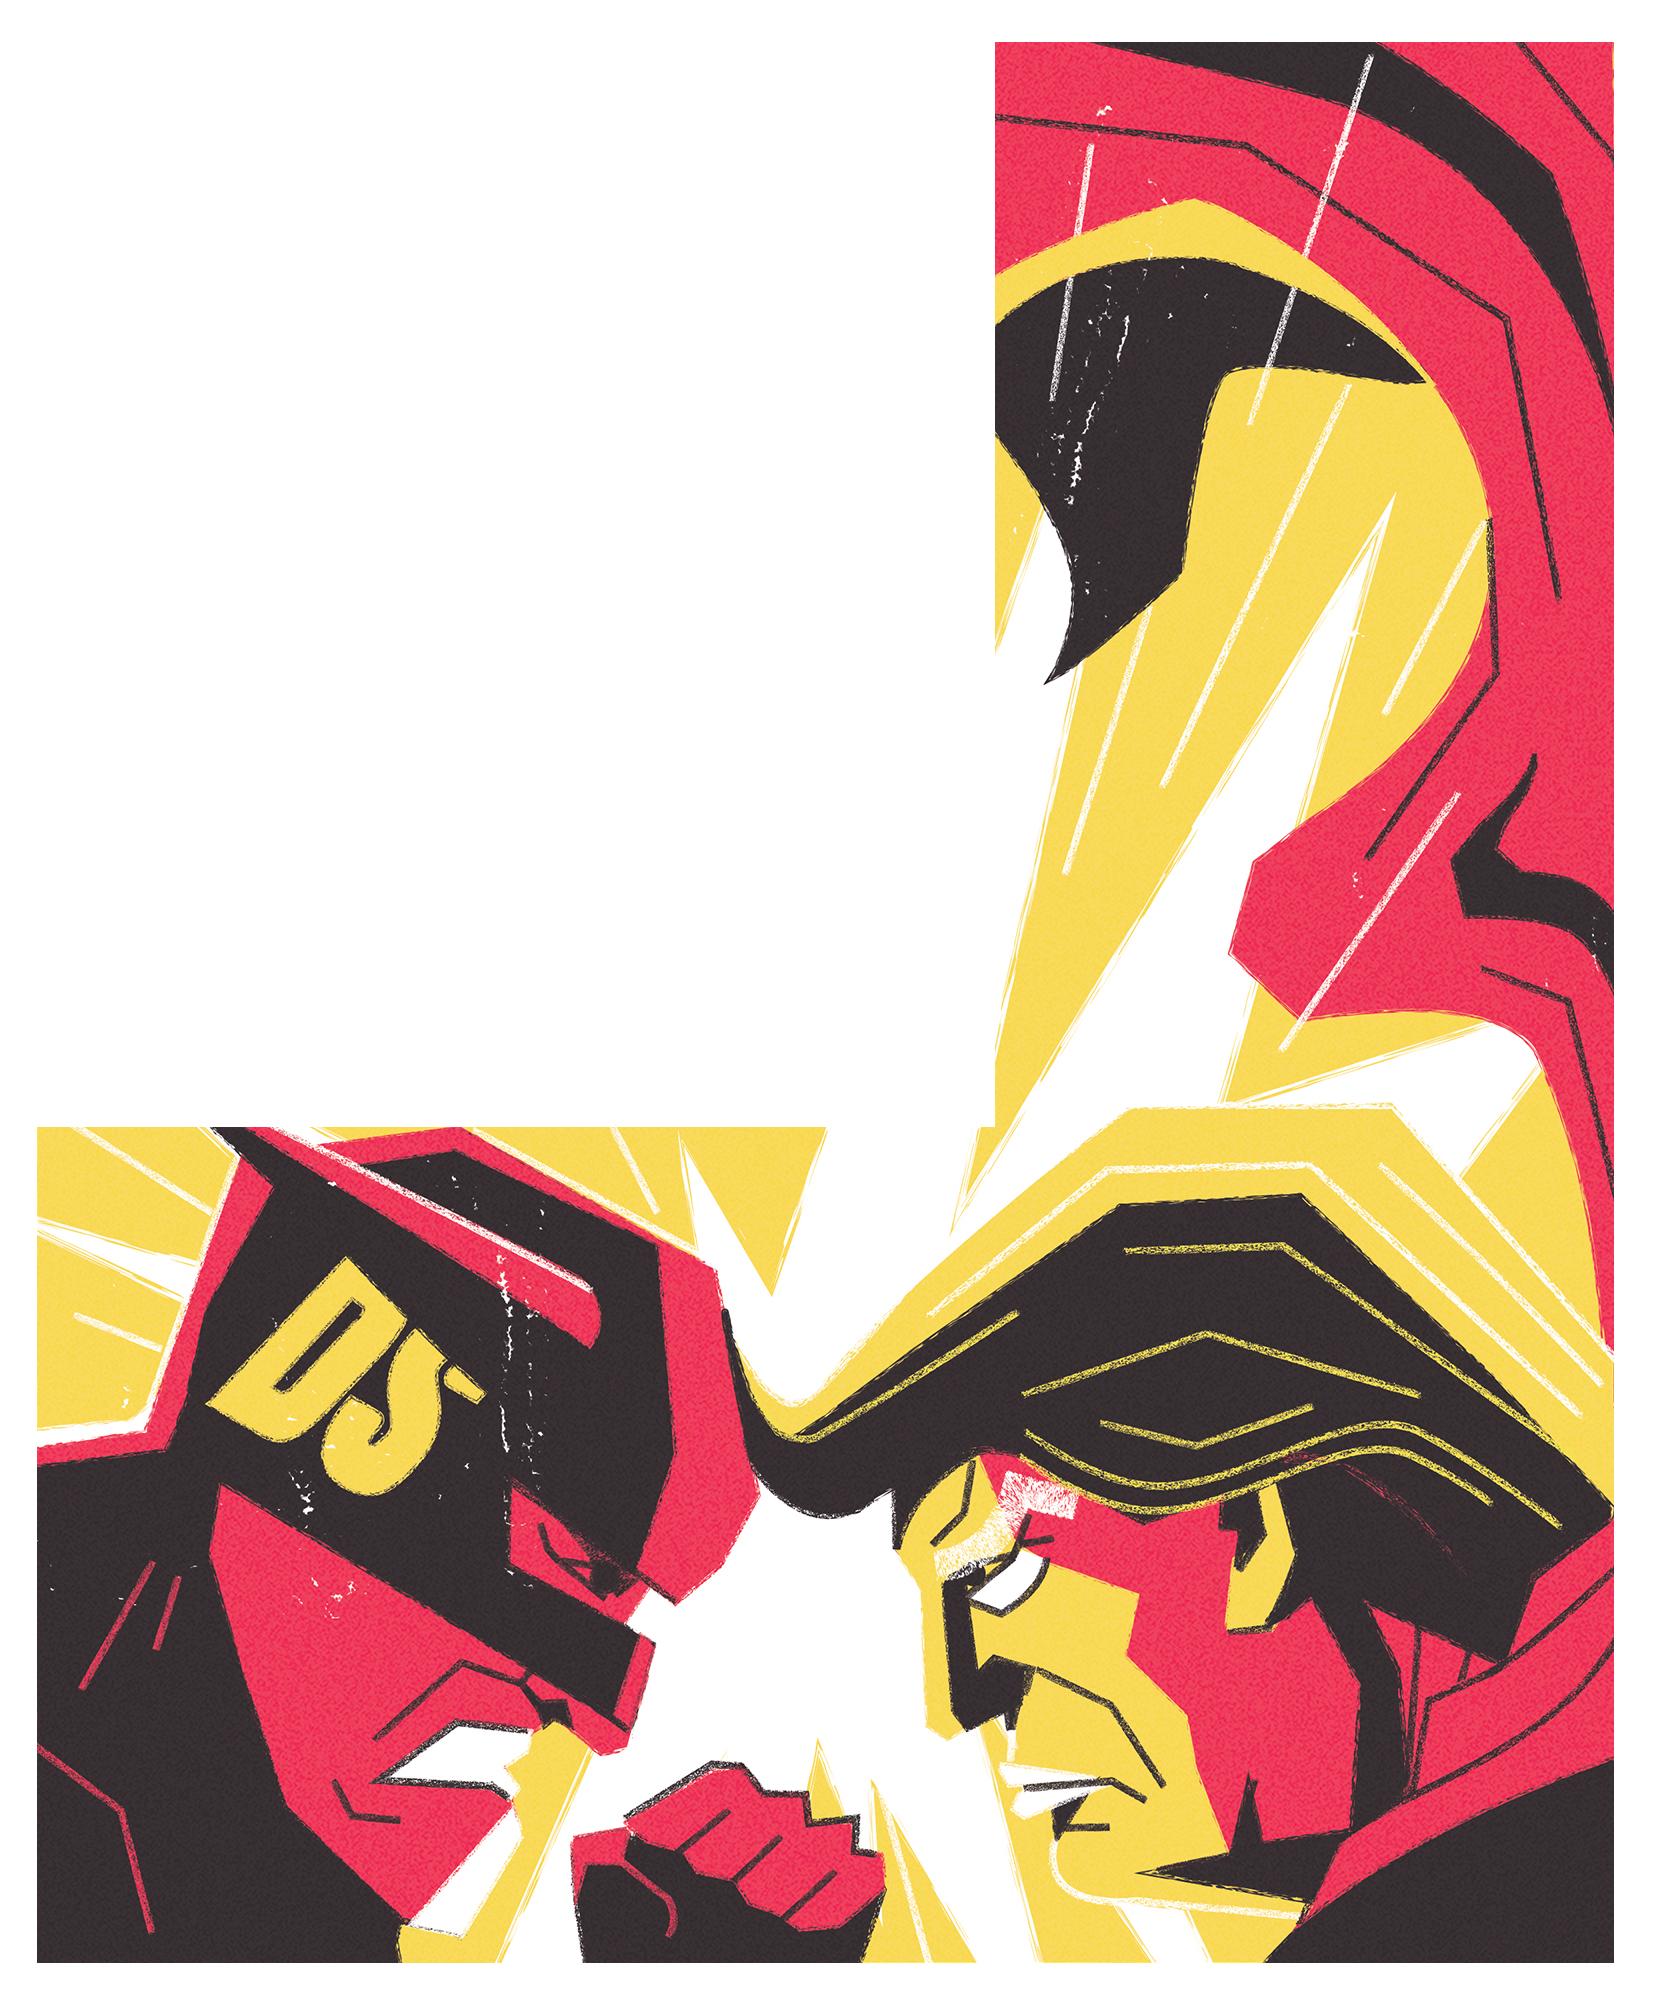 dale edwin murray freelance illustrator the jackal magazine illustration